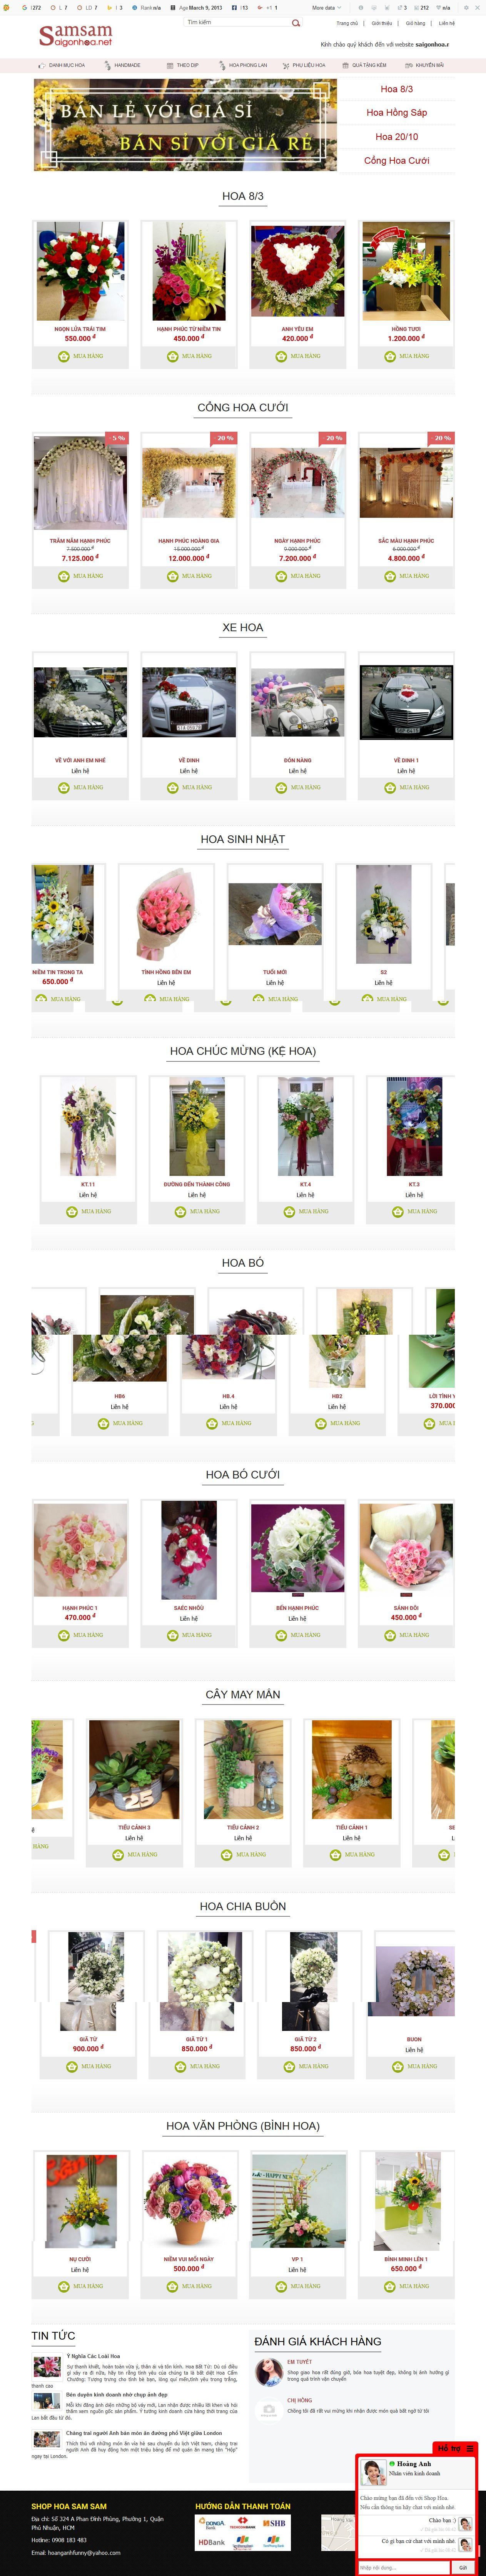 Mẫu website bán hoa 10109